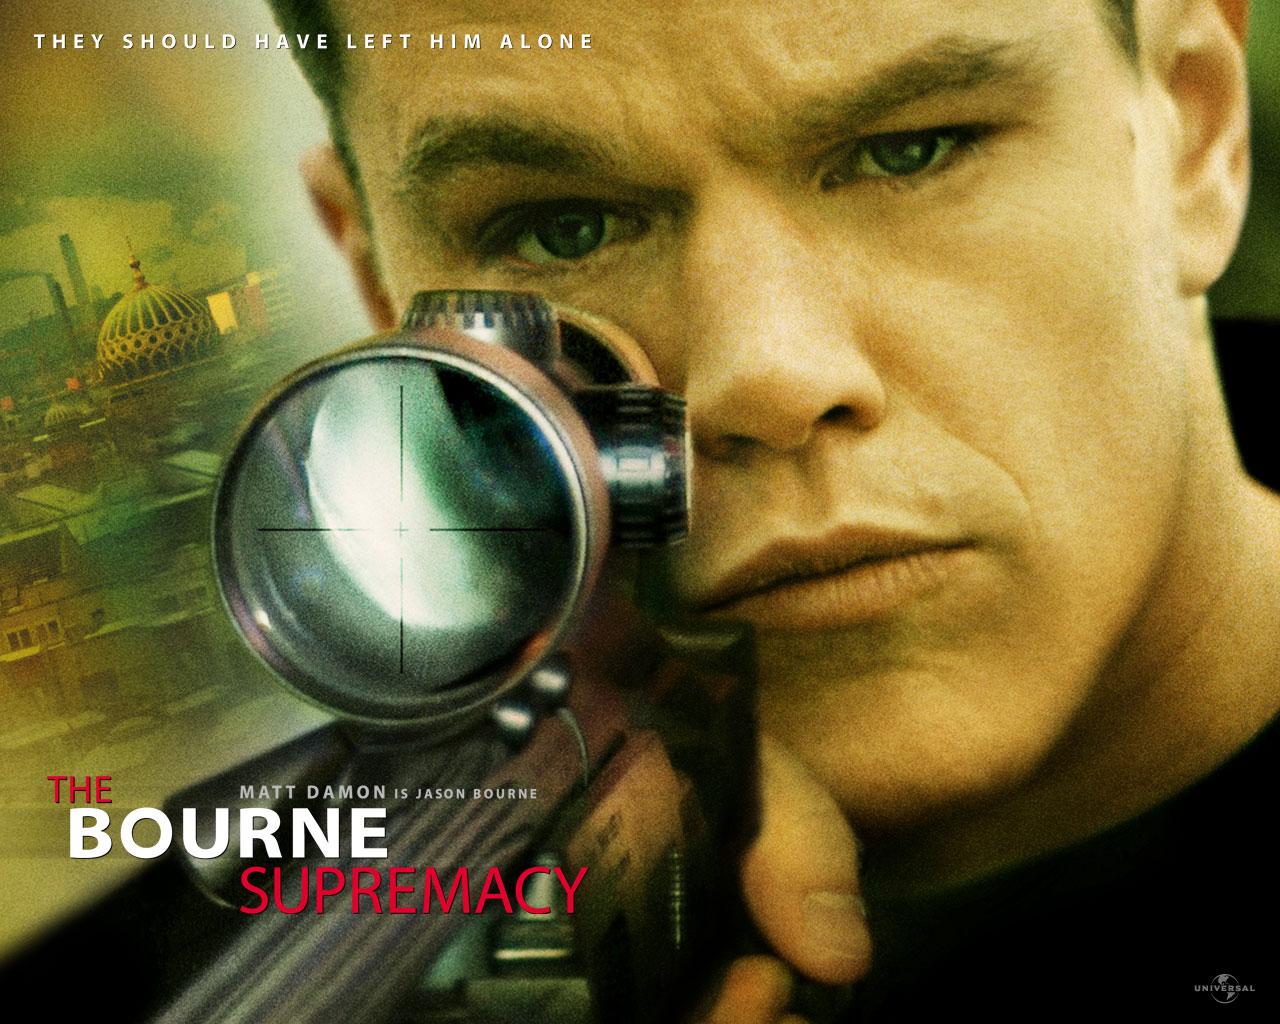 http://2.bp.blogspot.com/_KQO3DjgYdBU/TScxe-p3vNI/AAAAAAAAAFY/-WUXep3QF7E/s1600/The-Bourne-Supremacy.jpg